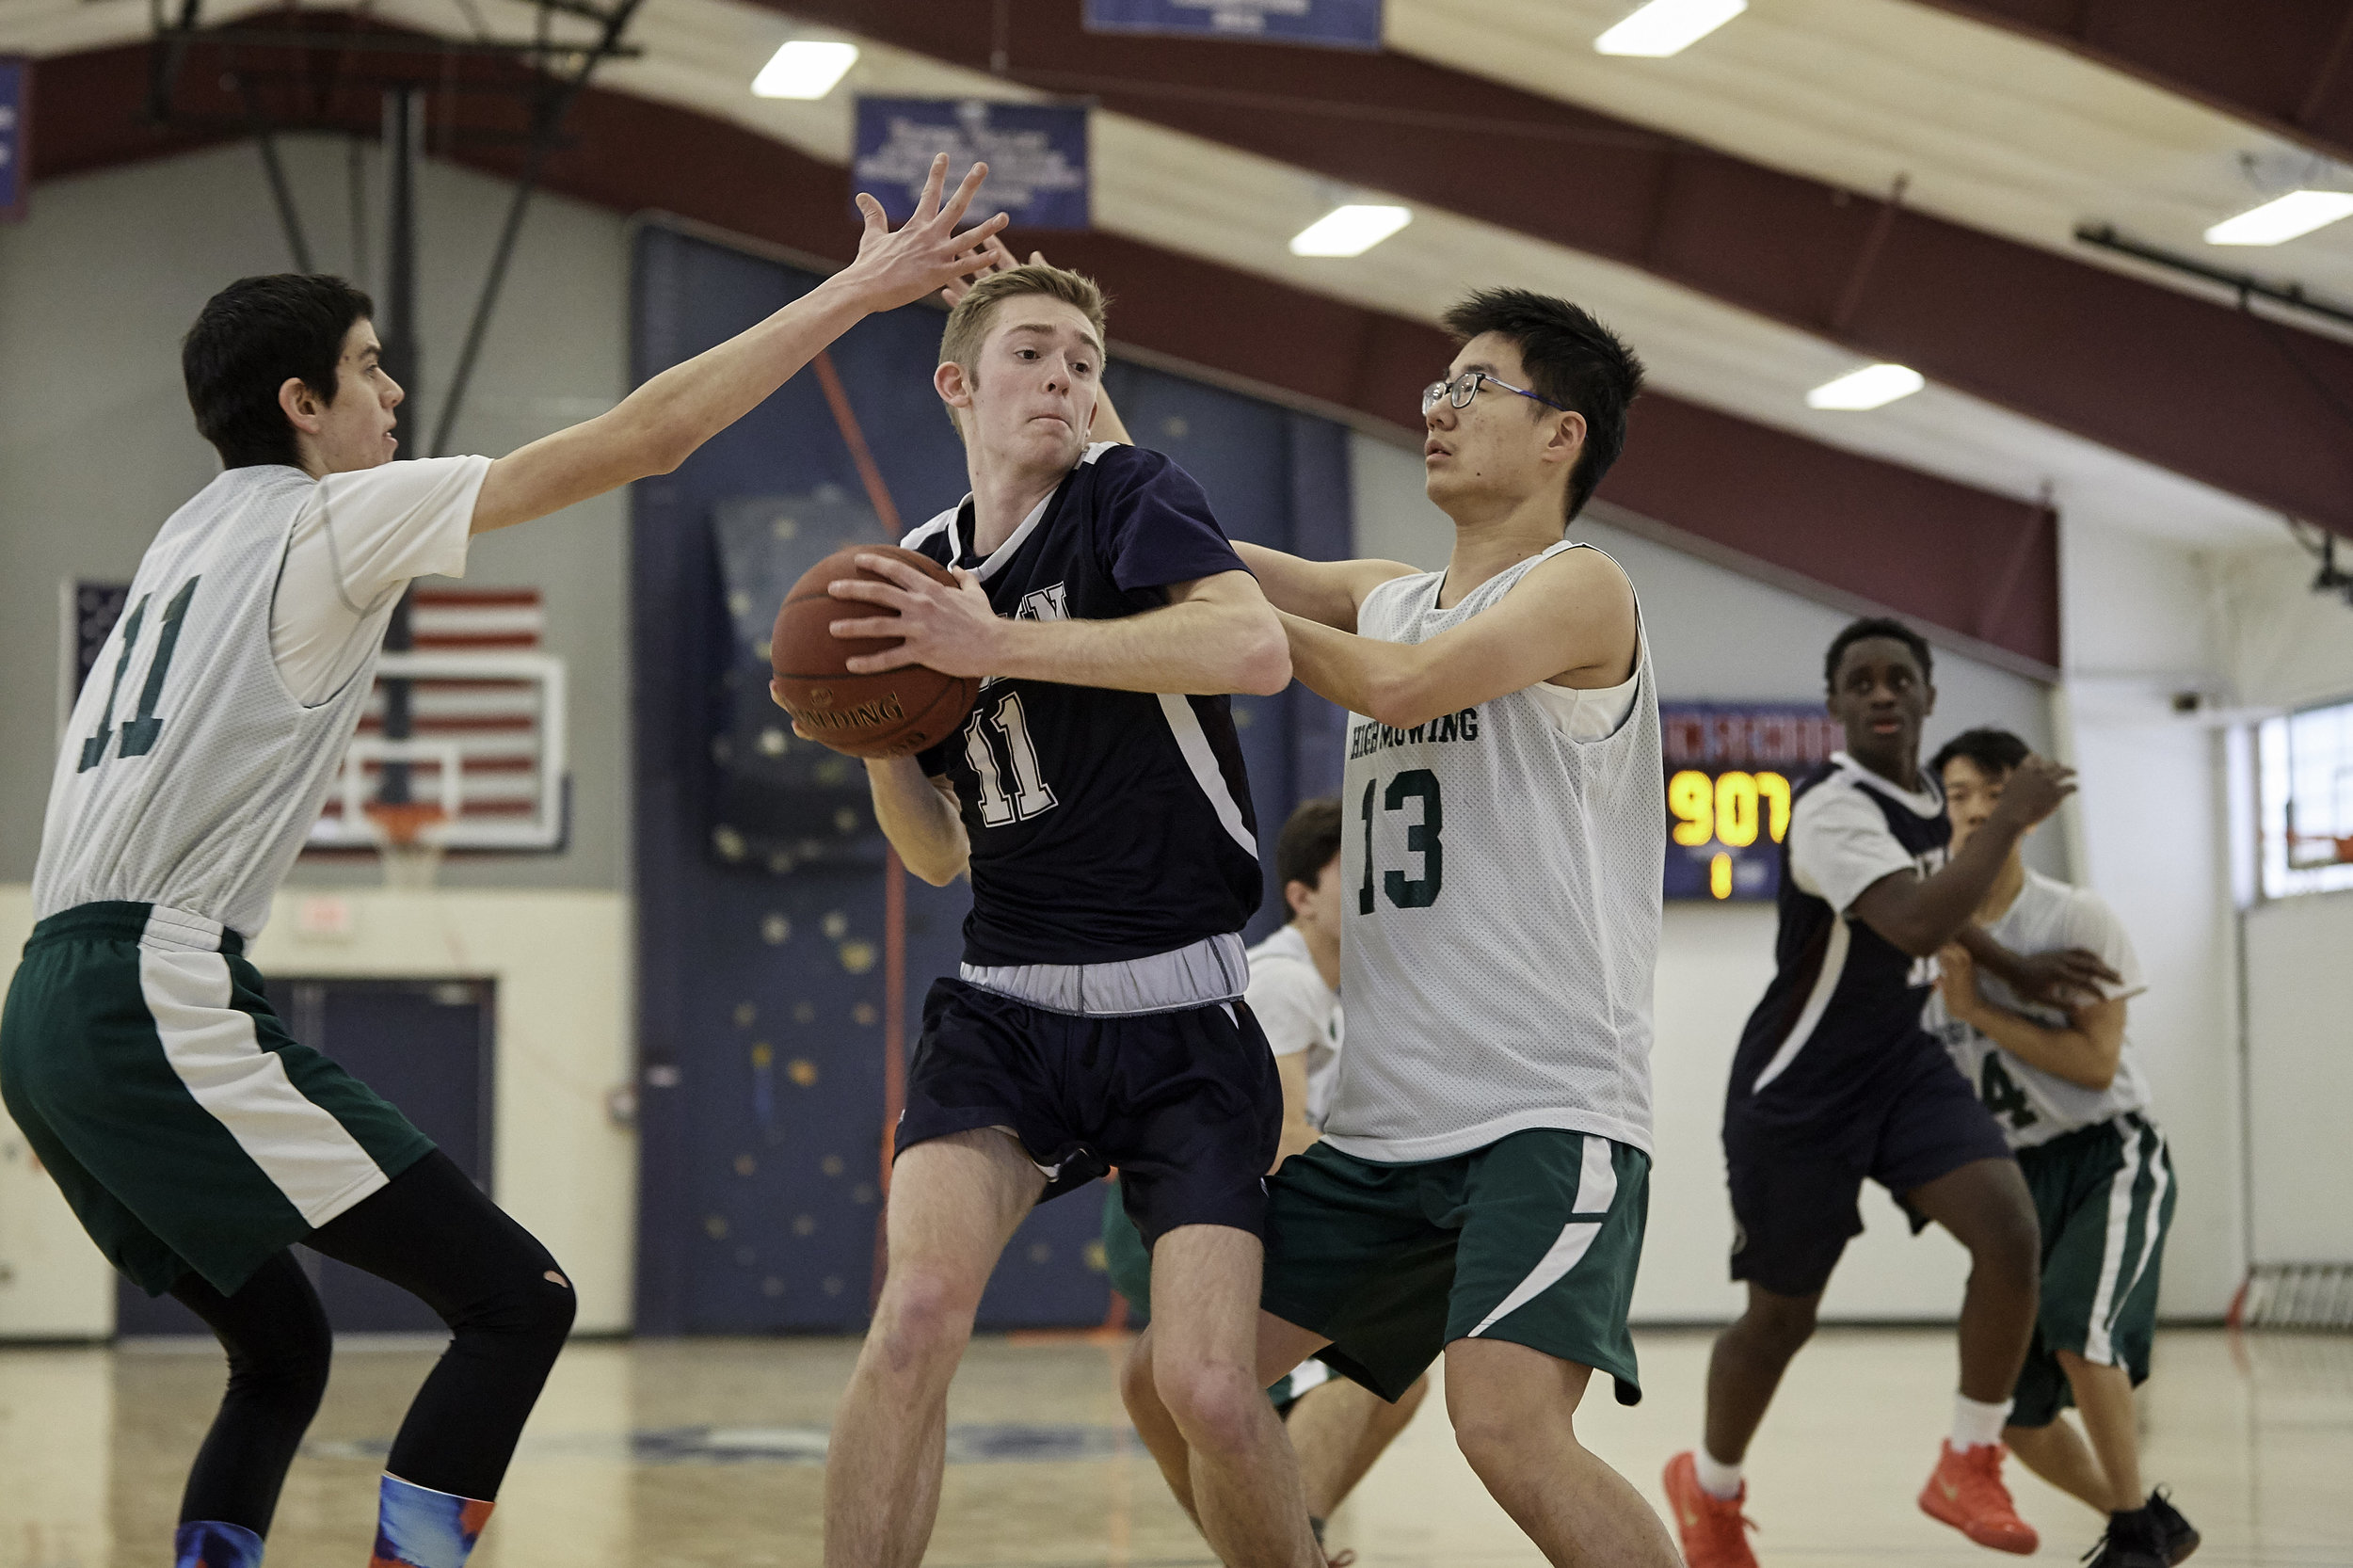 Boys Varsity Basketball vs High Mowing School - Feb 02 2019 - 0011.jpg